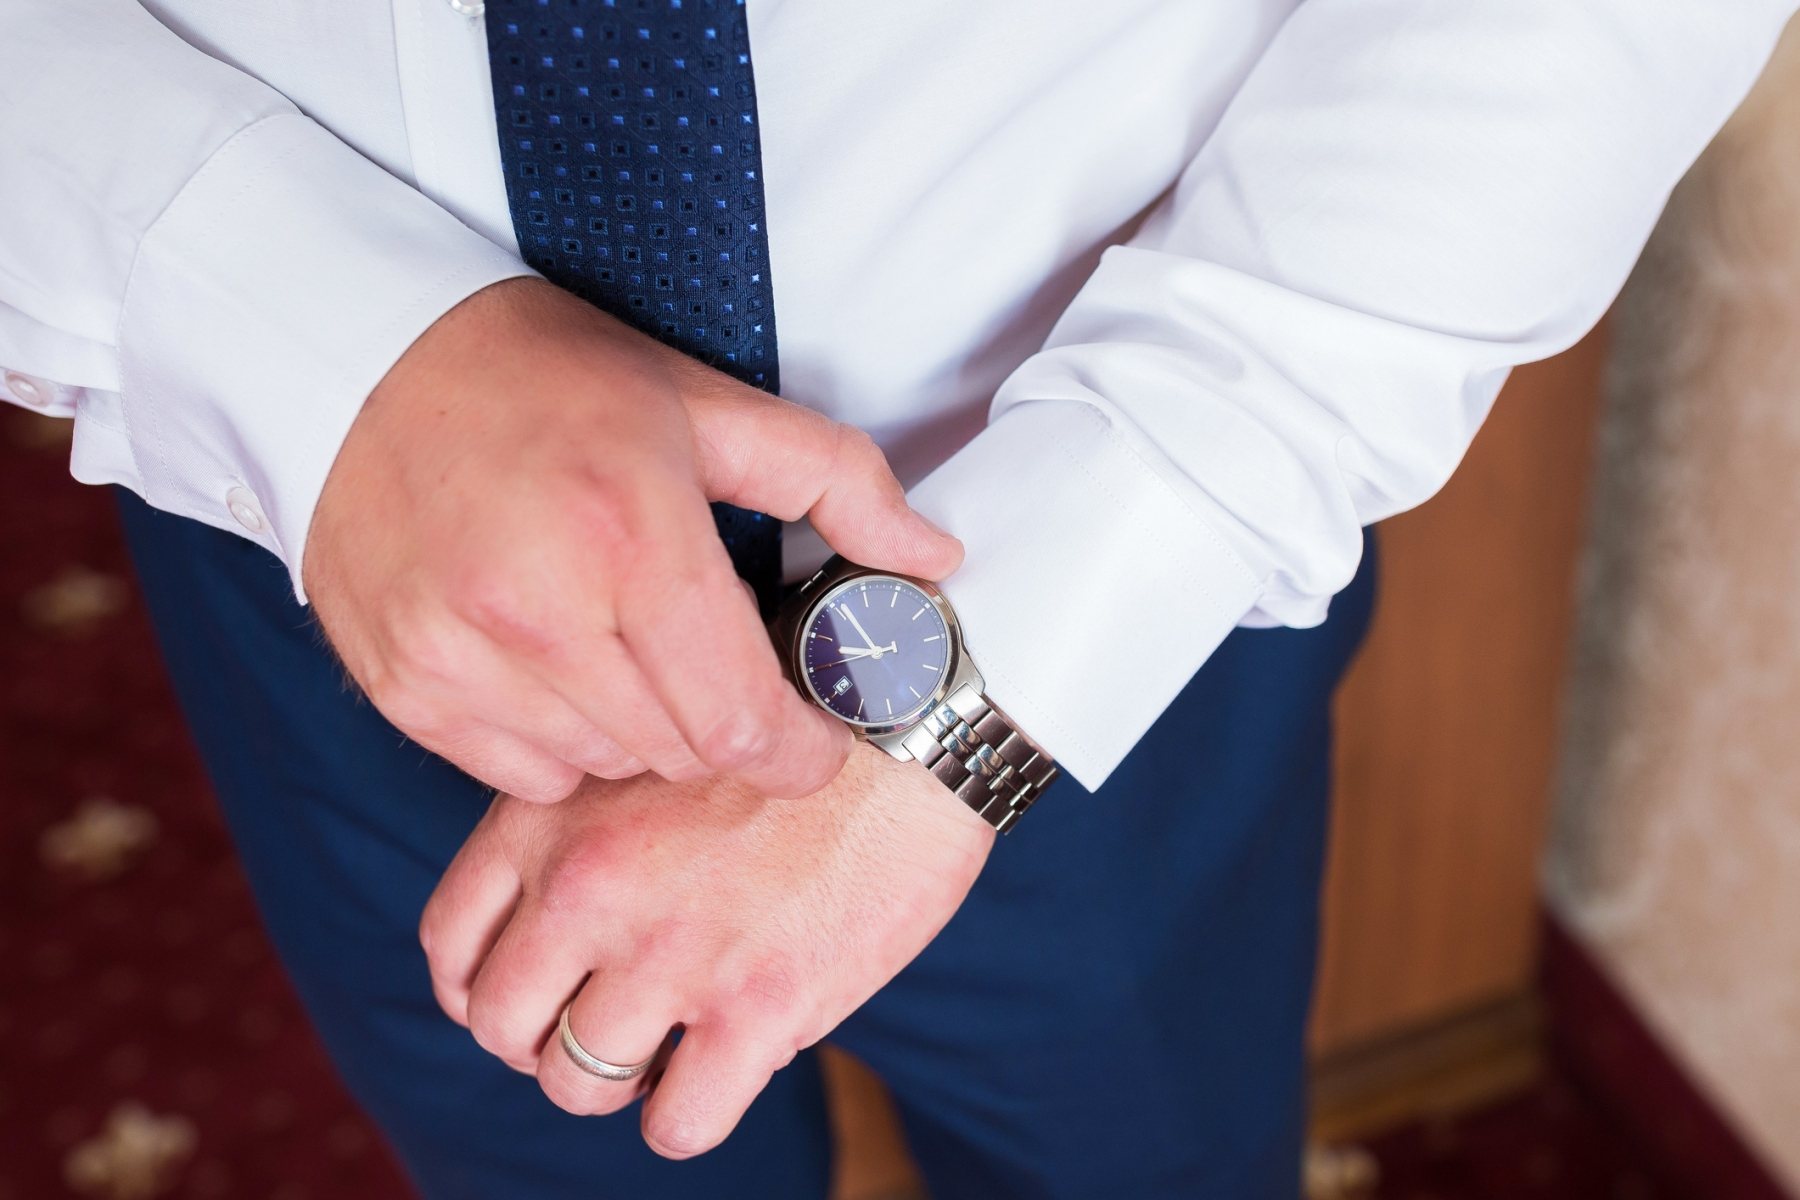 japan-young-business-men-wearing-watches-tiny-teen-schoolgirl-anal